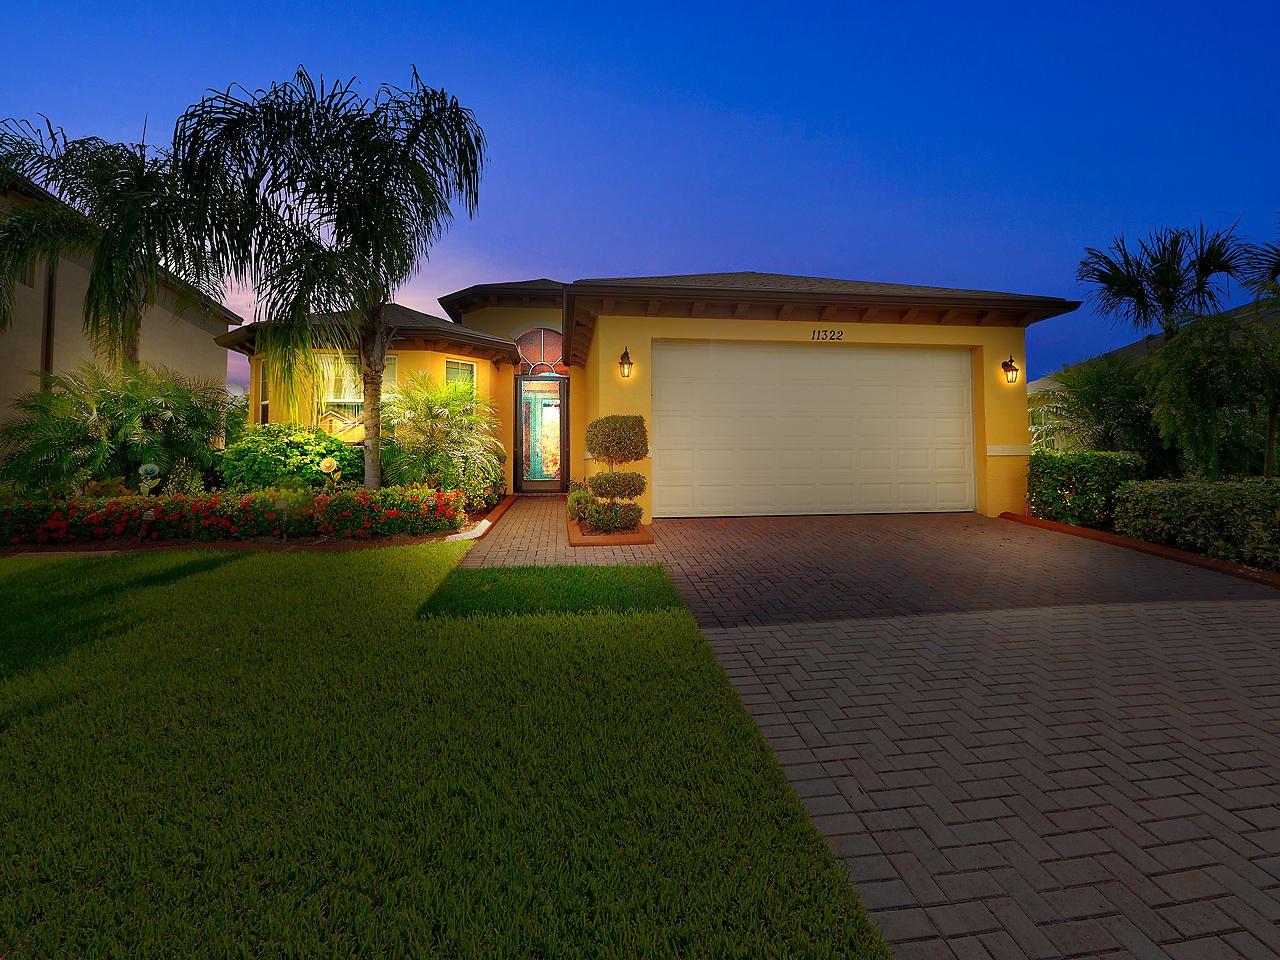 11322 SW Barton Way, Port Saint Lucie, FL 34987 - #: RX-10639958